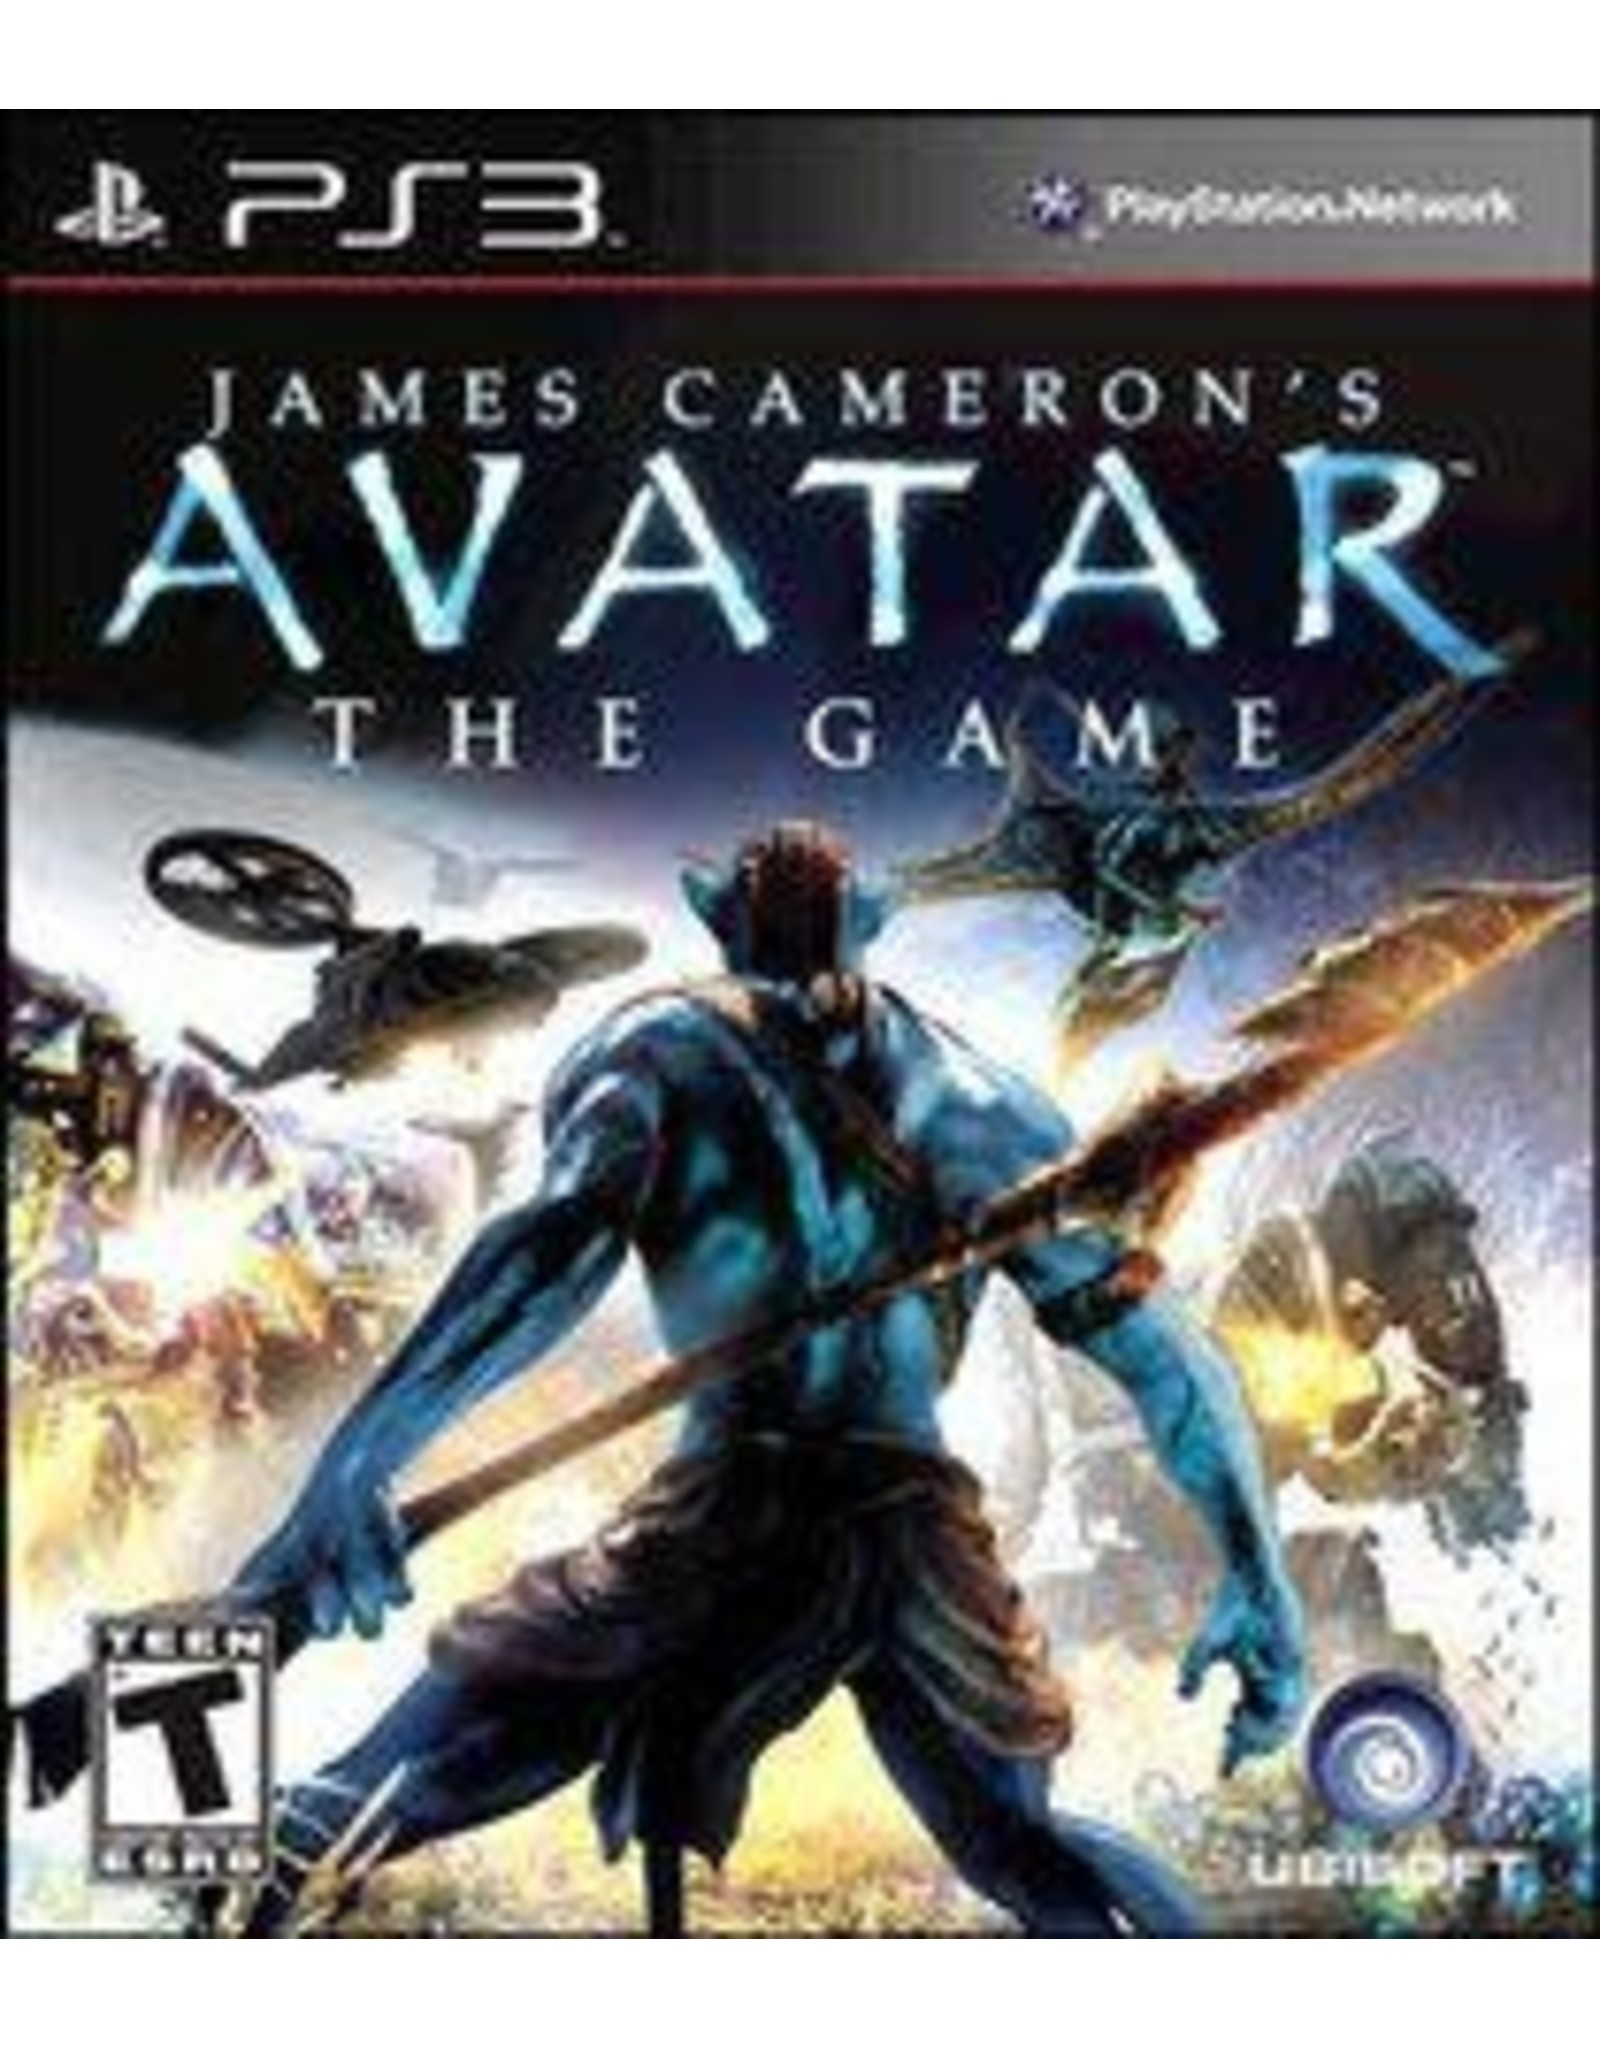 Playstation 3 Avatar: The Game (CiB)